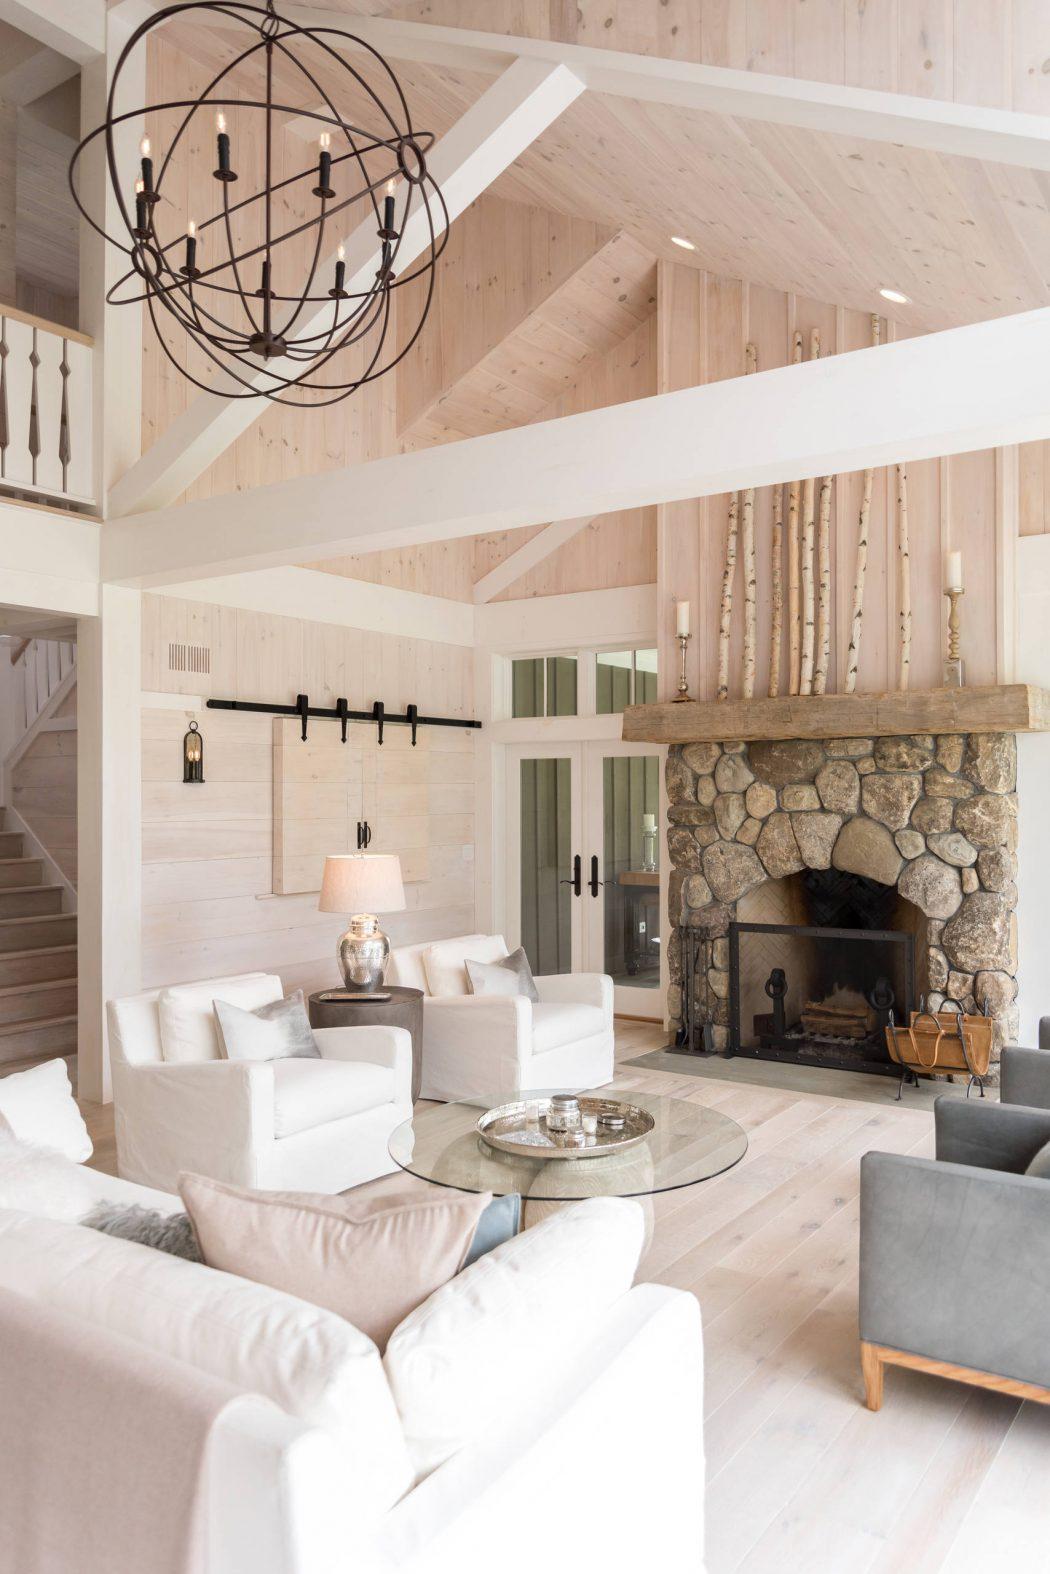 016-gothic-cottage-daniel-contelmo-architects-1050x1574